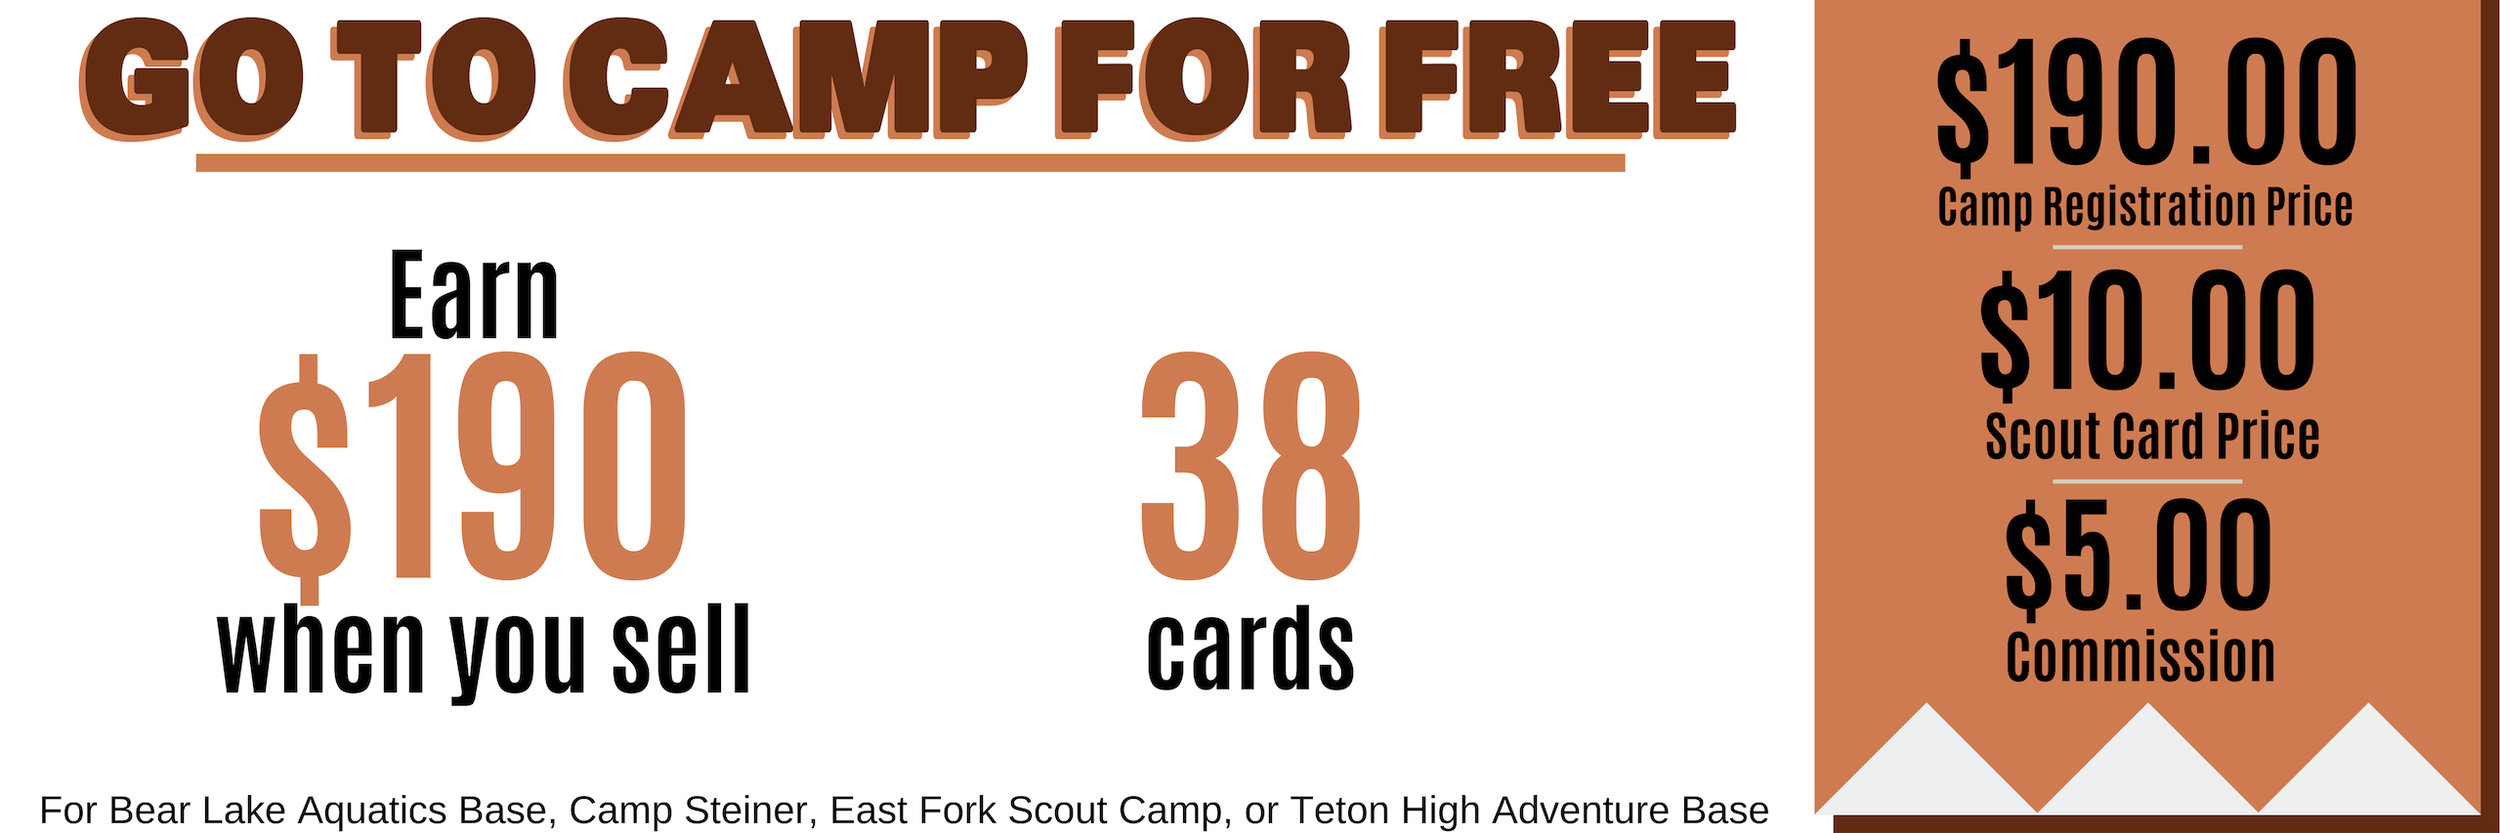 Scout Card Banner 2.jpg